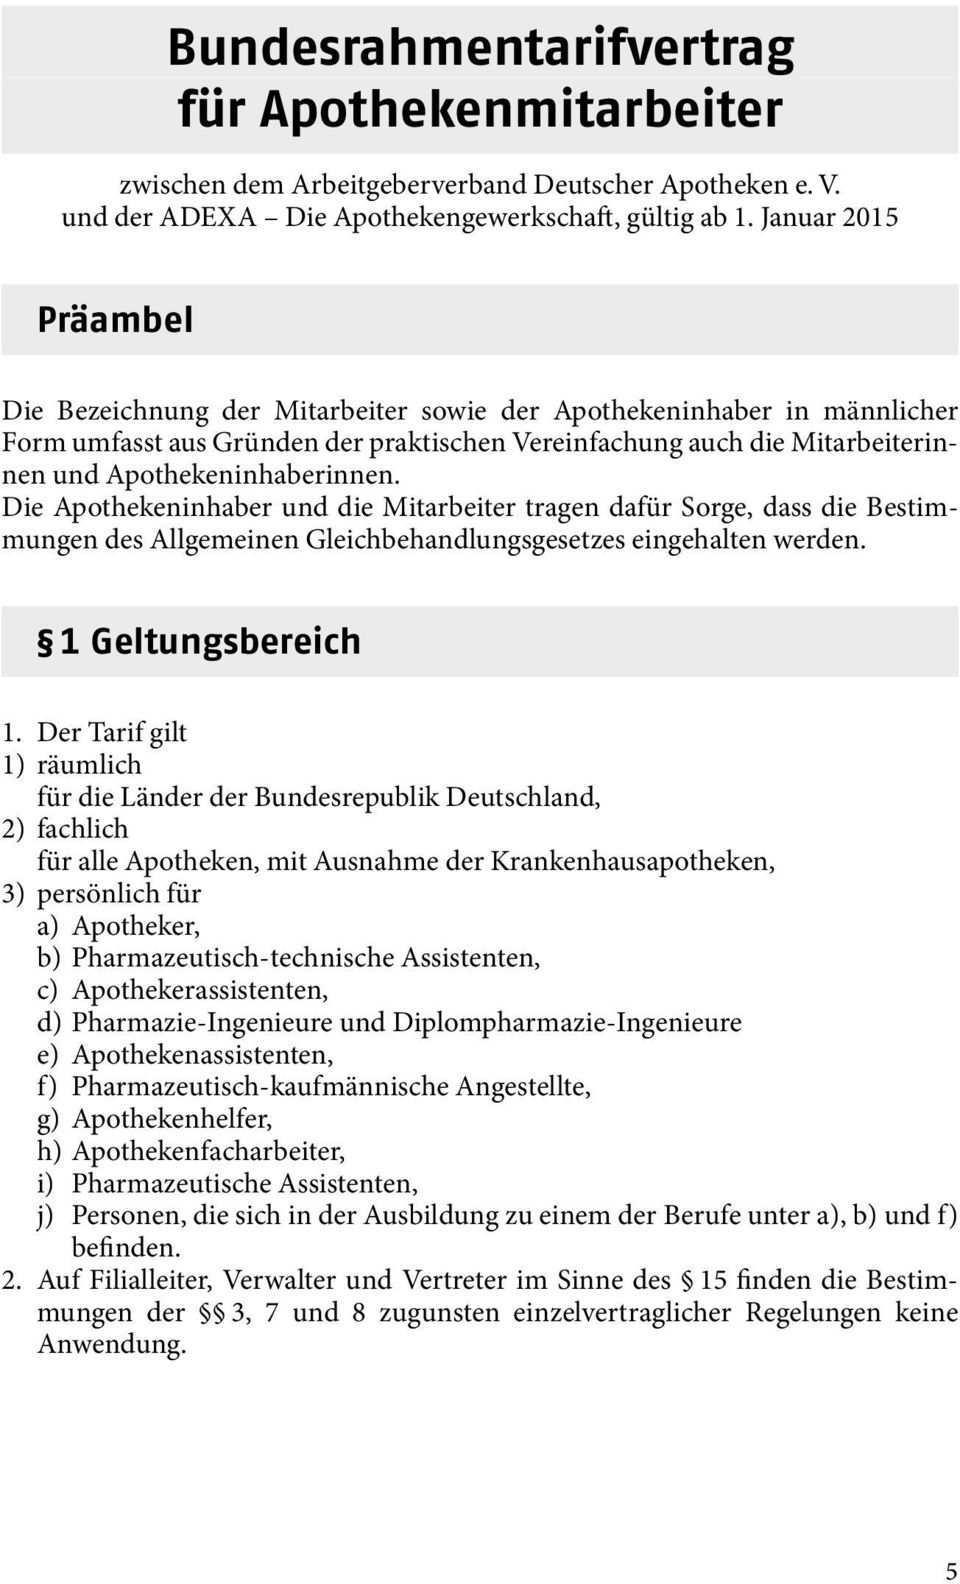 Bundesrahmentarifvertrag Fur Apothekenmitarbeiter Pdf Kostenfreier Download